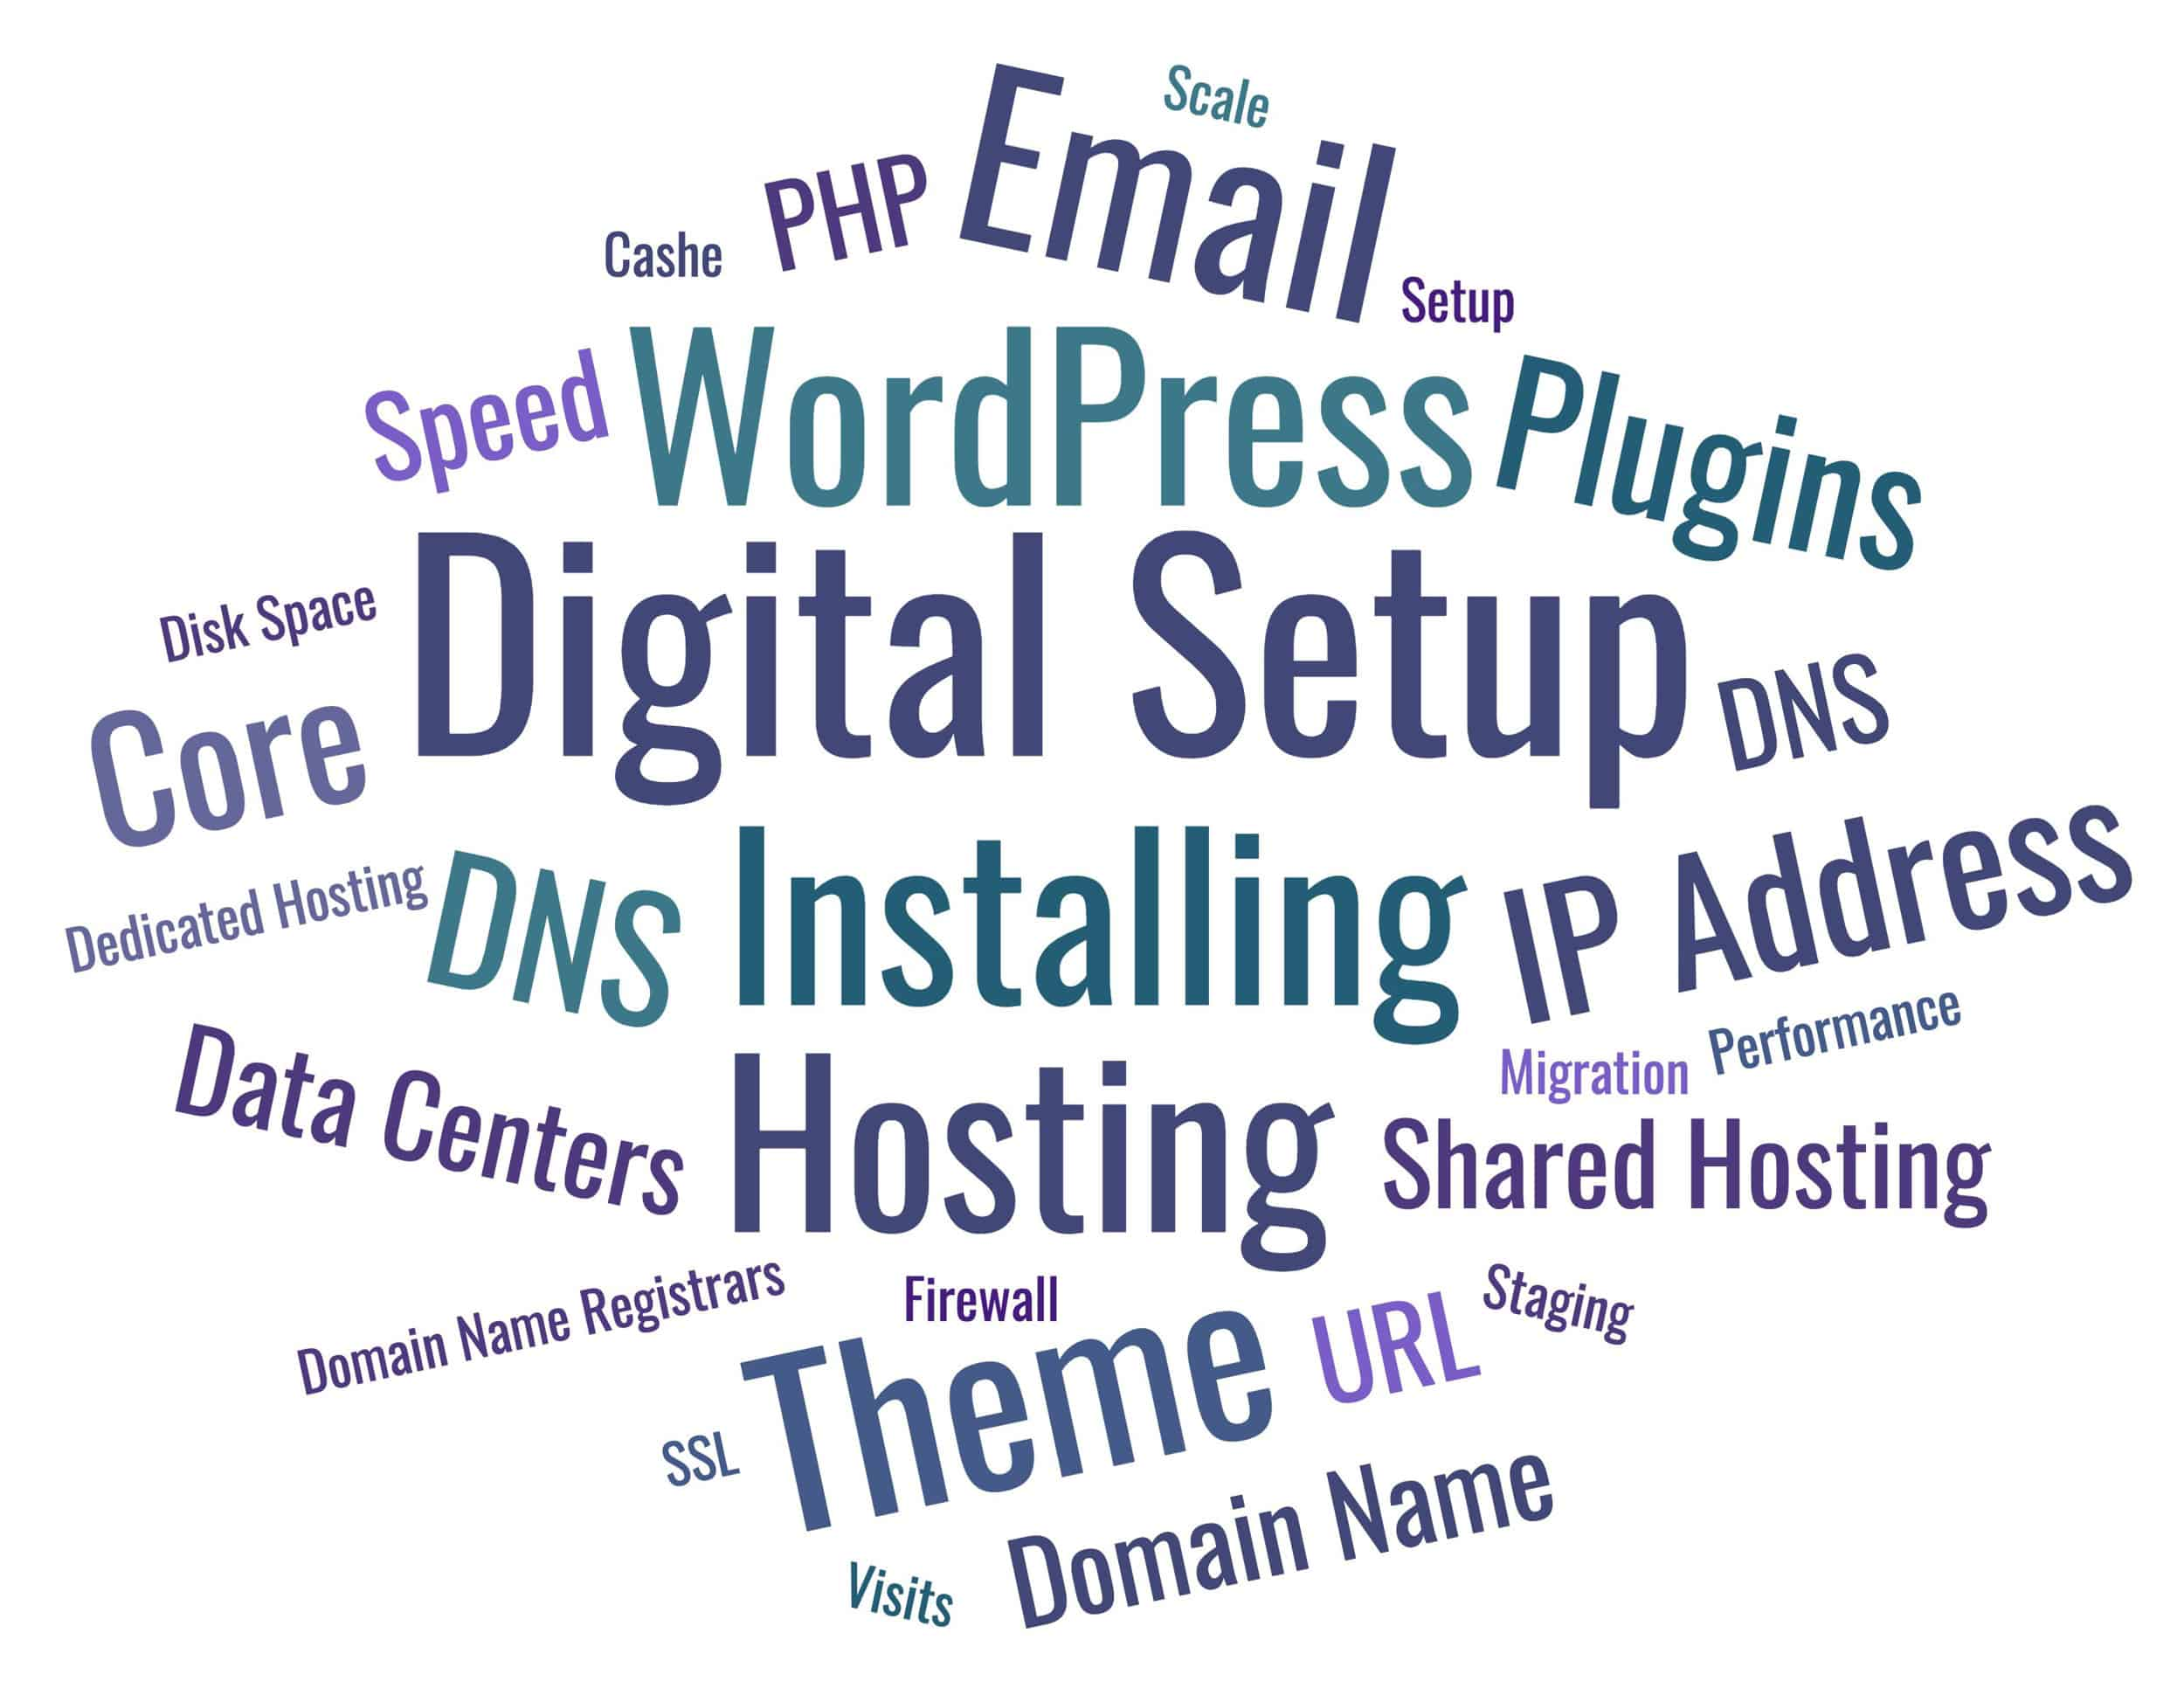 Words describing Digital Setup – WordPress, Installing, Hosting, Email, Theme, DNS, Plugins, PHP, SSL